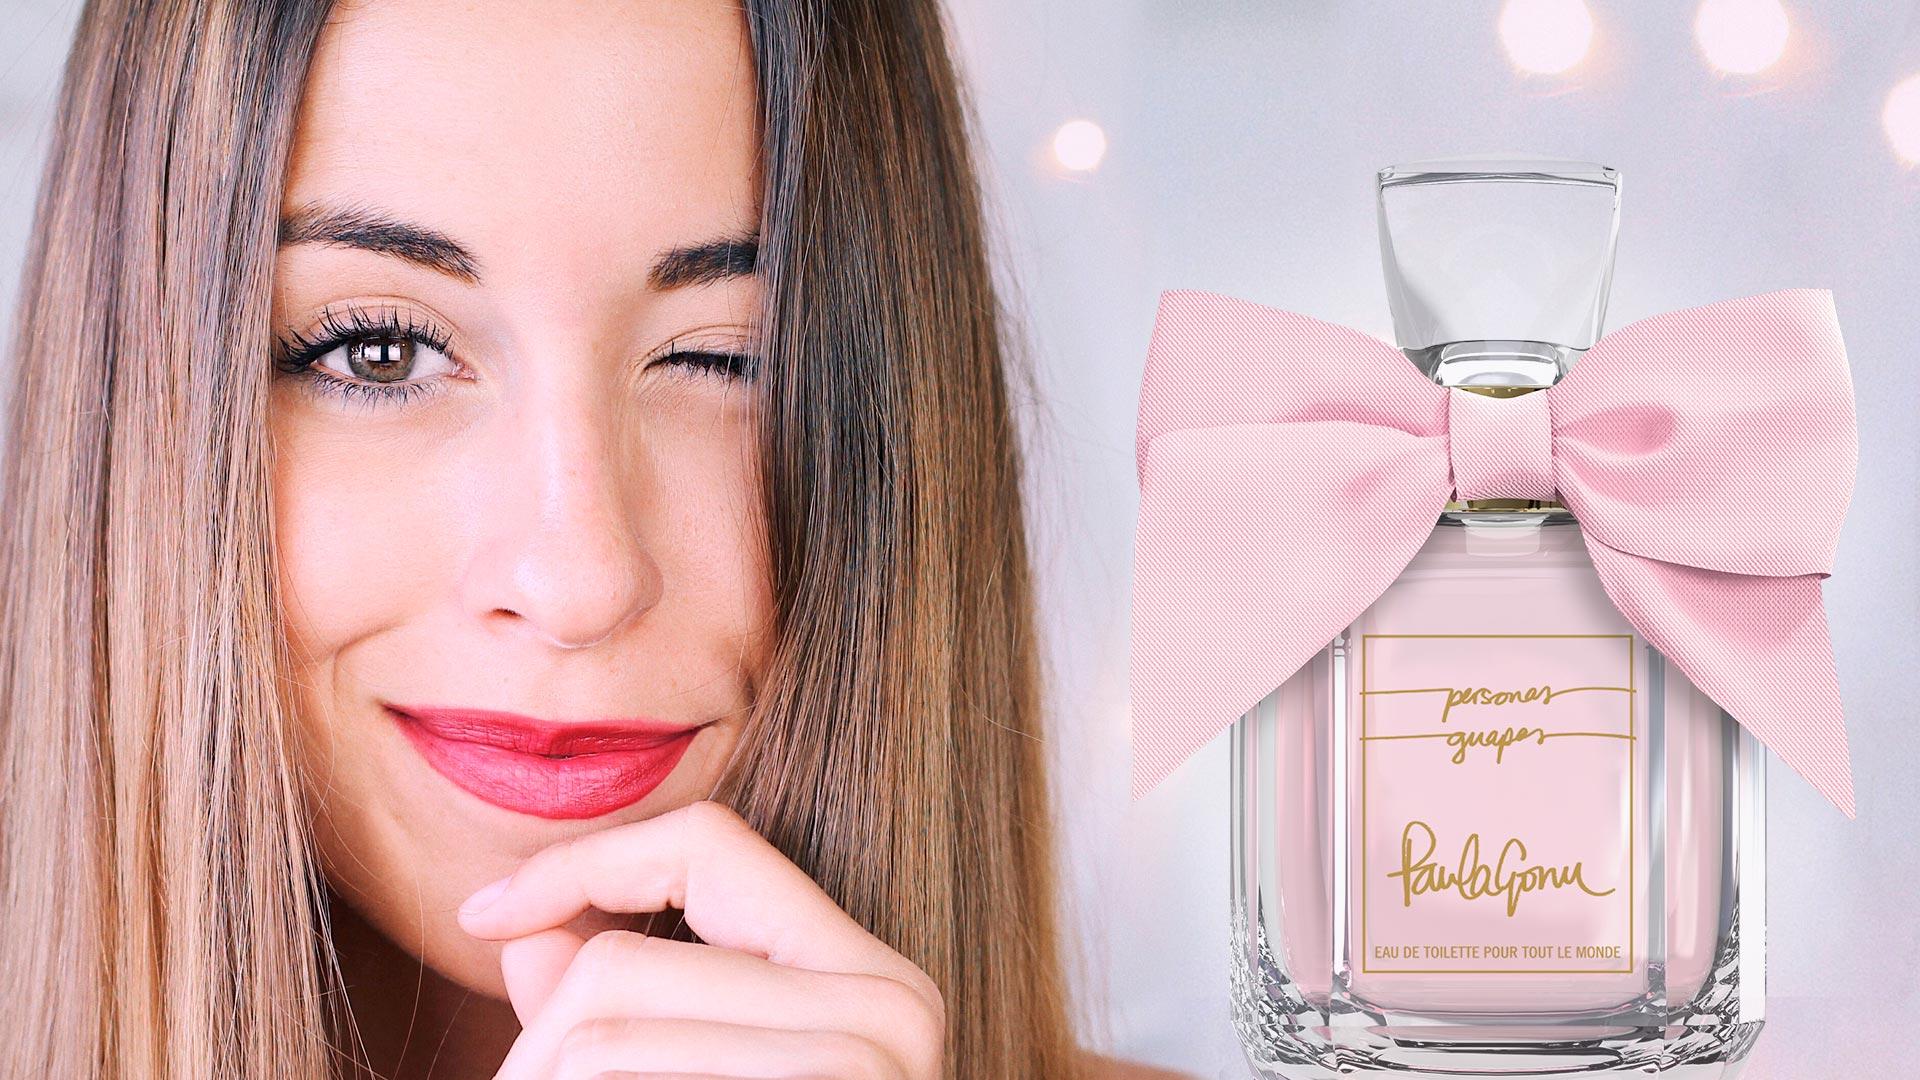 Paula-Gonu-Personas-Guapas-Fragancia-Magasalfa-Web